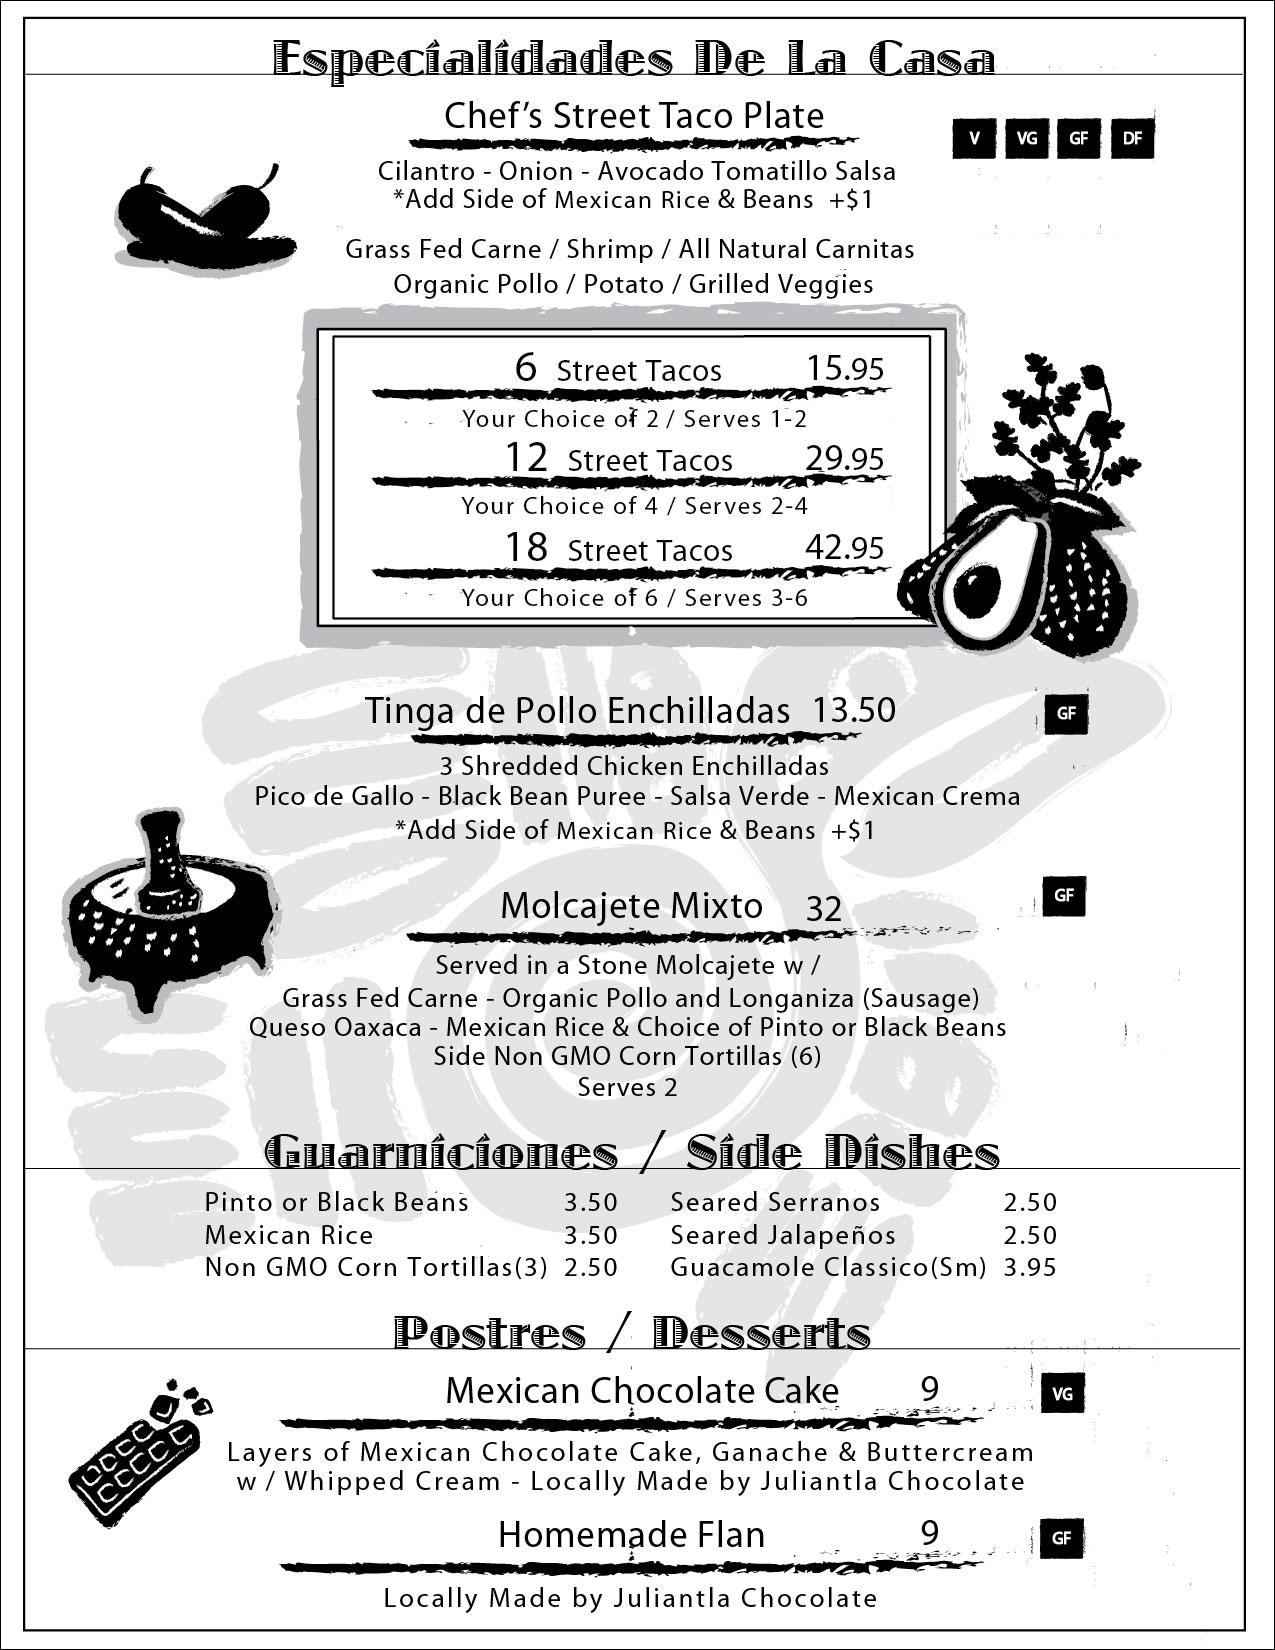 Special & Sides & Dessert